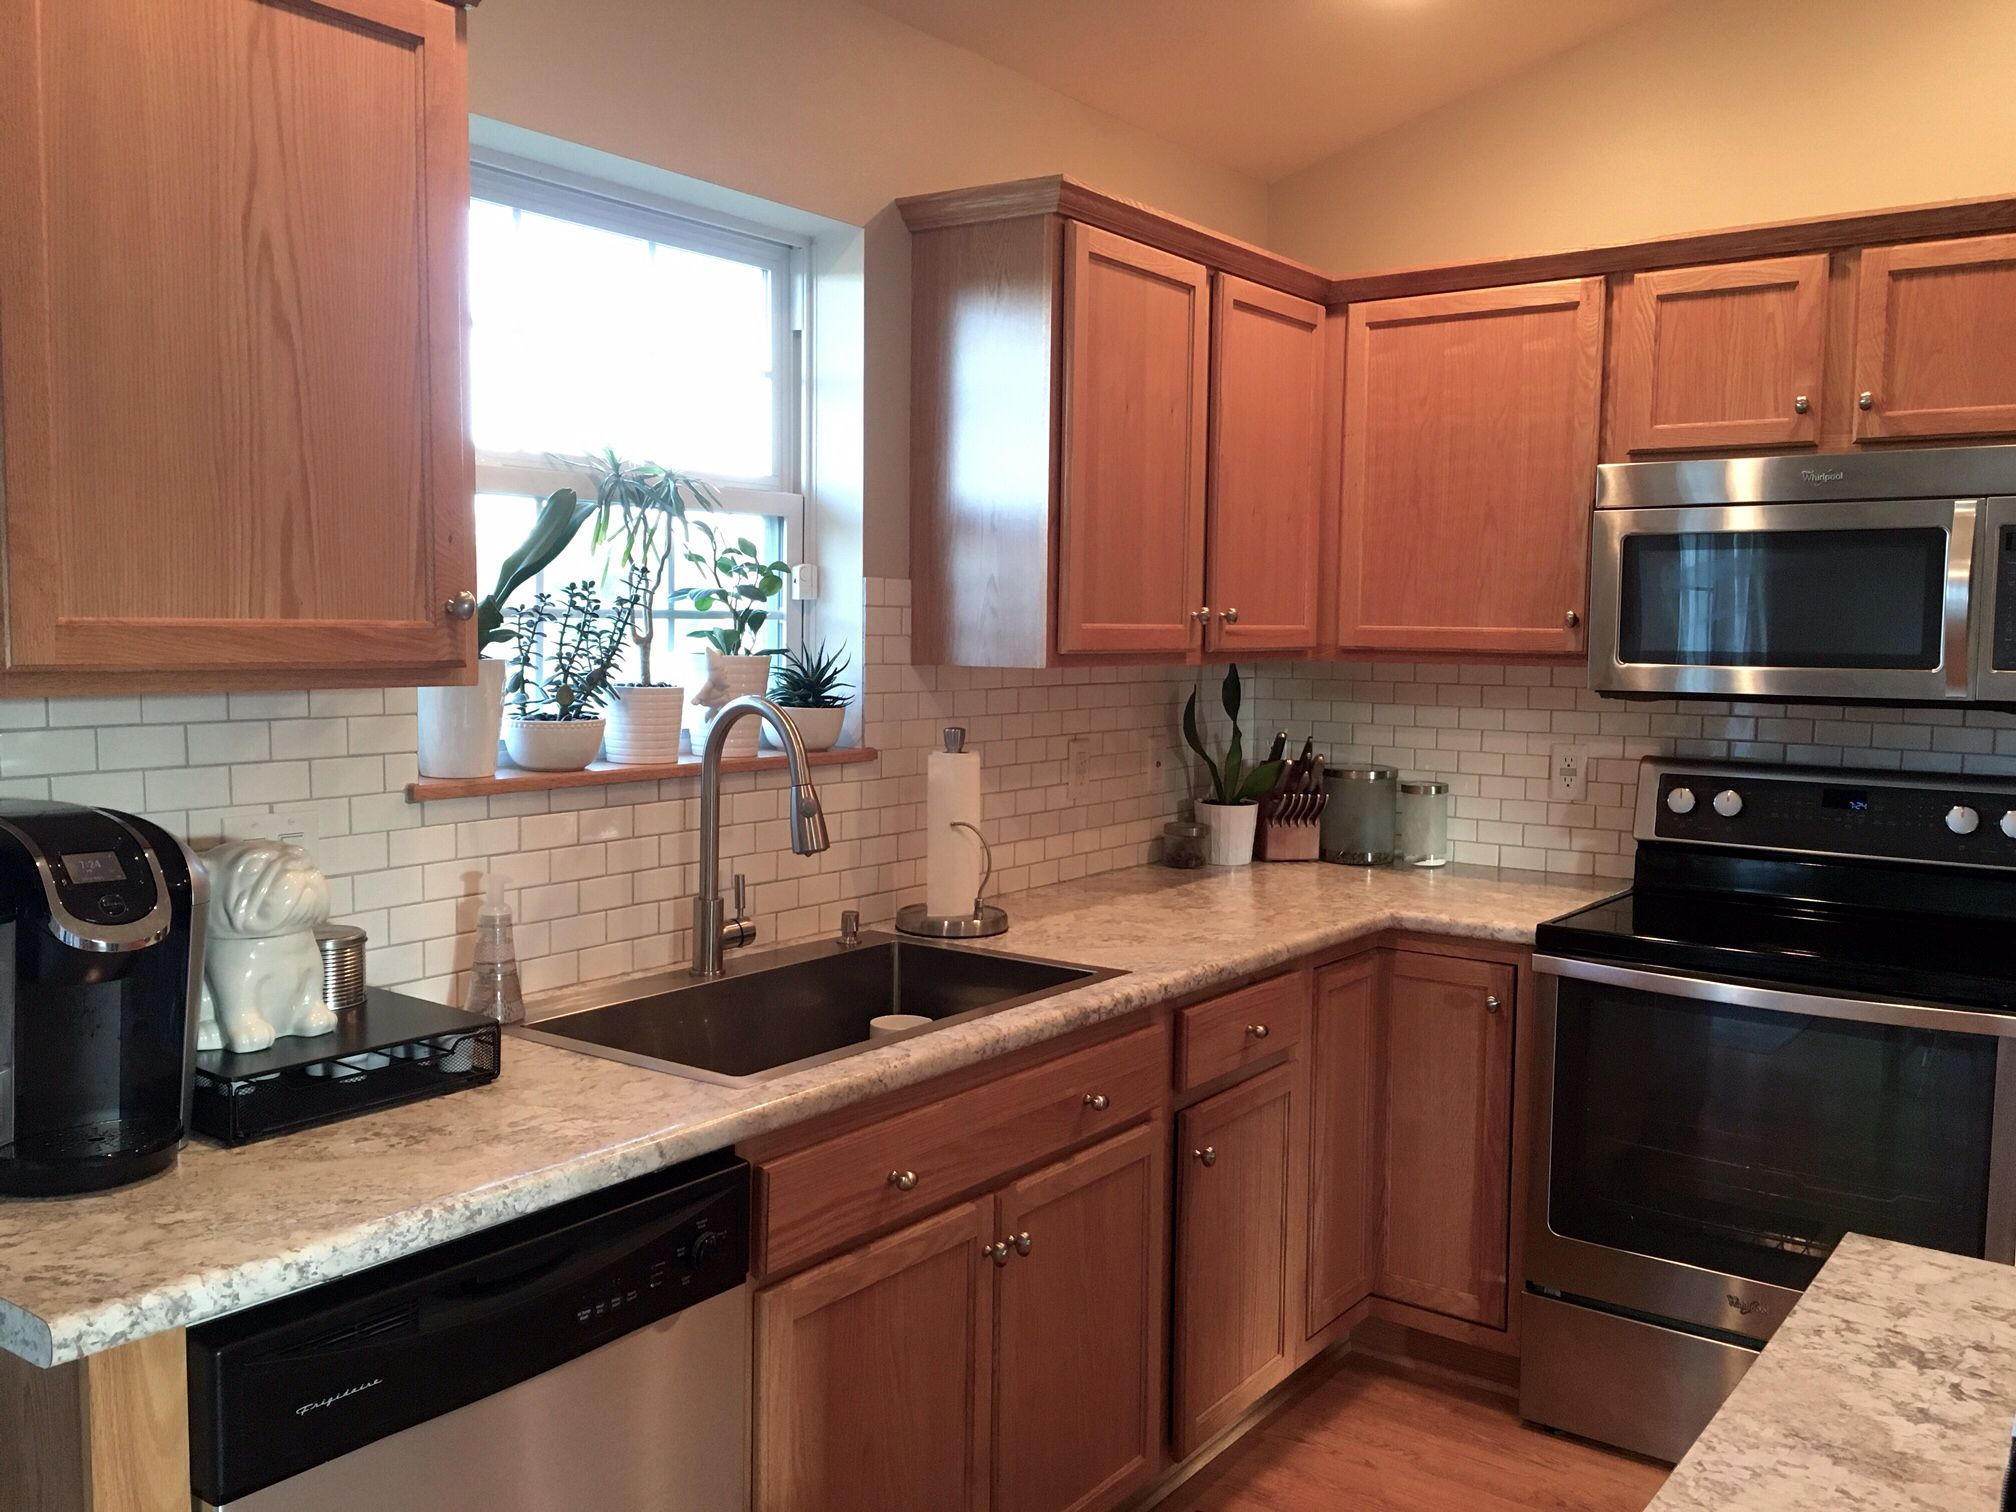 light oak kitchen cabinets smudge proof stainless steel appliances color idea don 39t like the subway tile backsplash